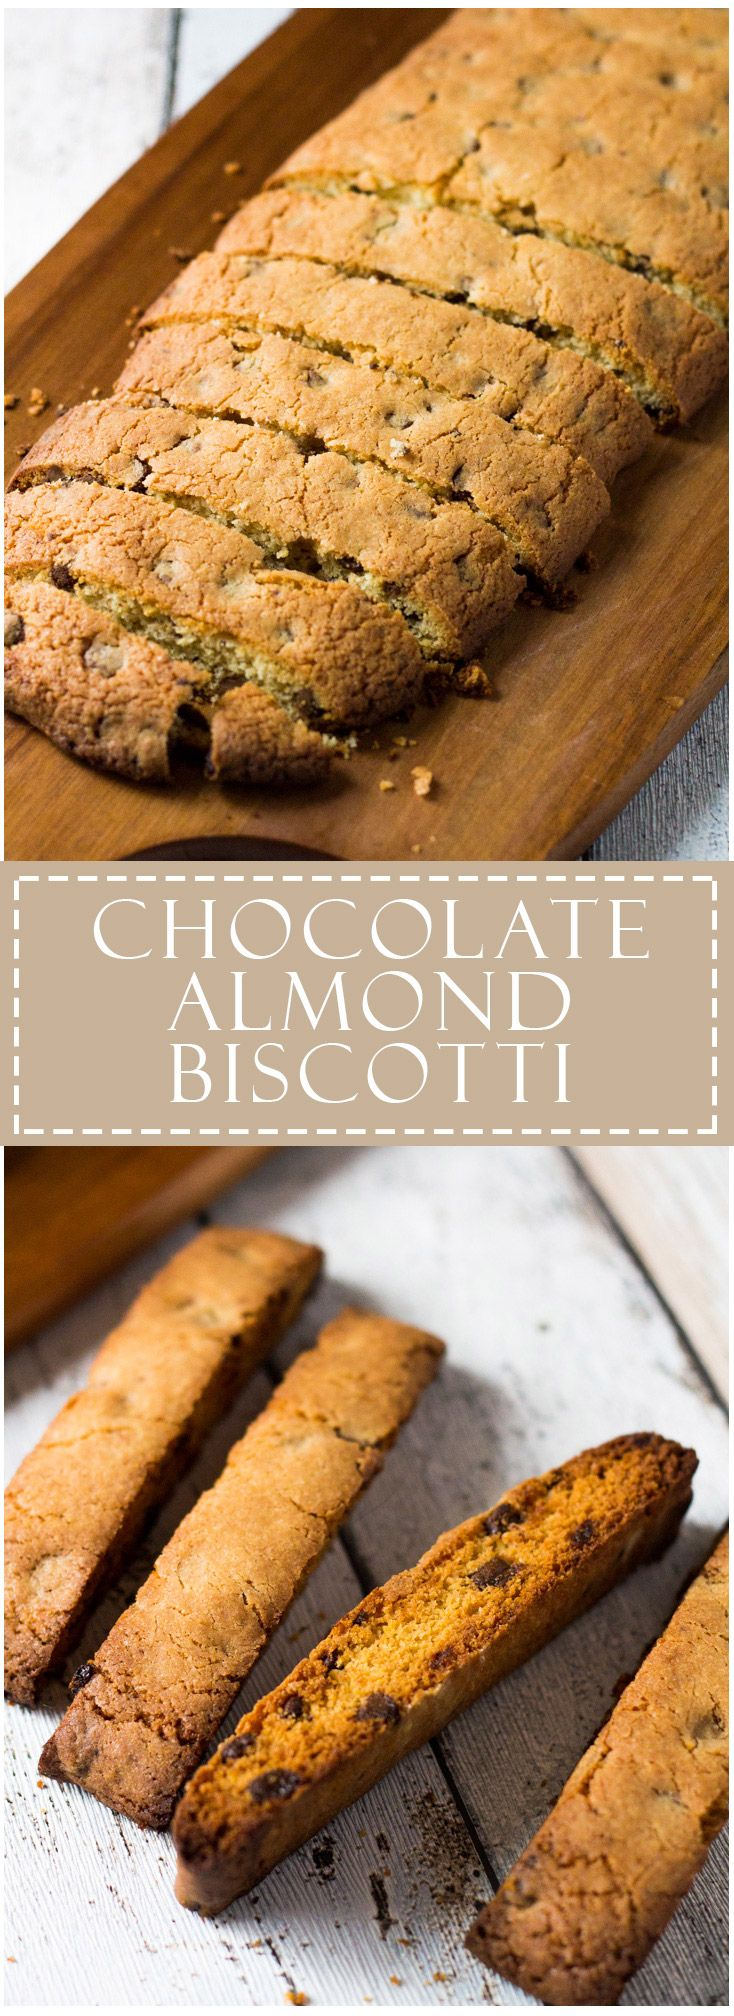 Chocolate Almond Biscotti | Marsha's Baking Addiction